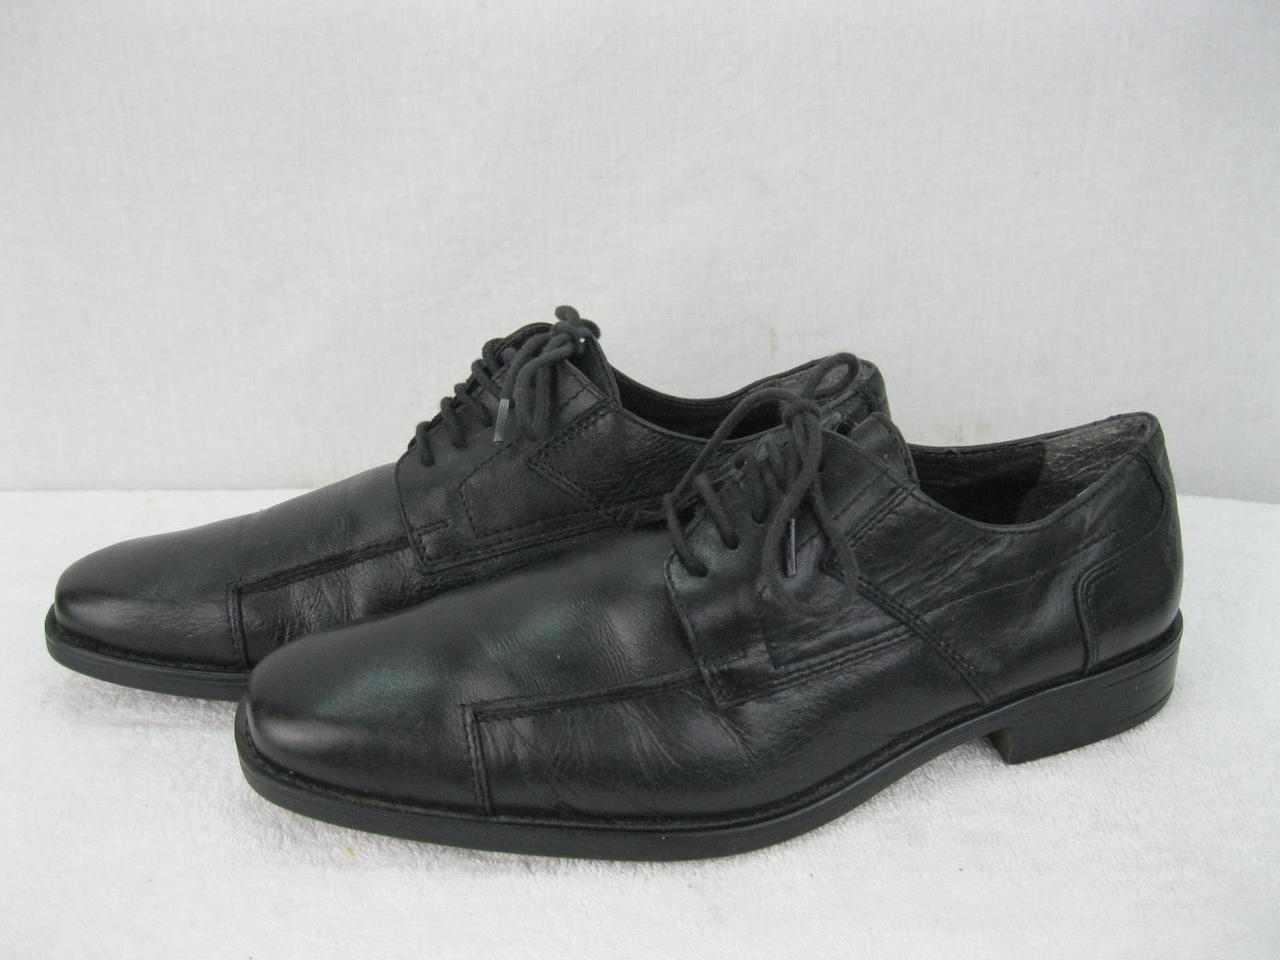 19b59fc54 Мужские туфли, классика натур кожа размер 40 - Интернет-магазин Second hand